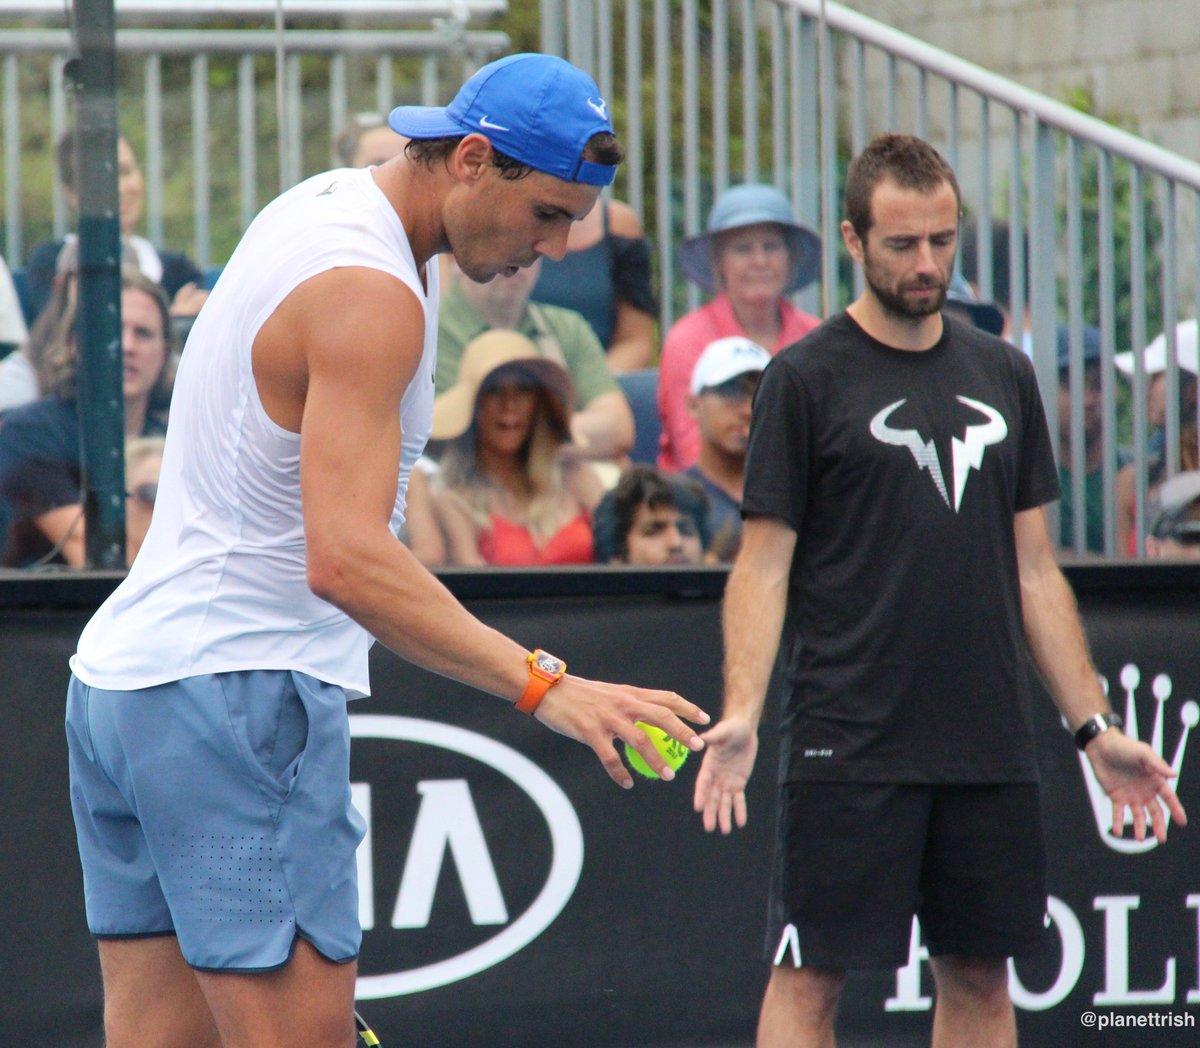 Lol Titin praying to the tennis gods  <br>http://pic.twitter.com/sKTNPrhoHW